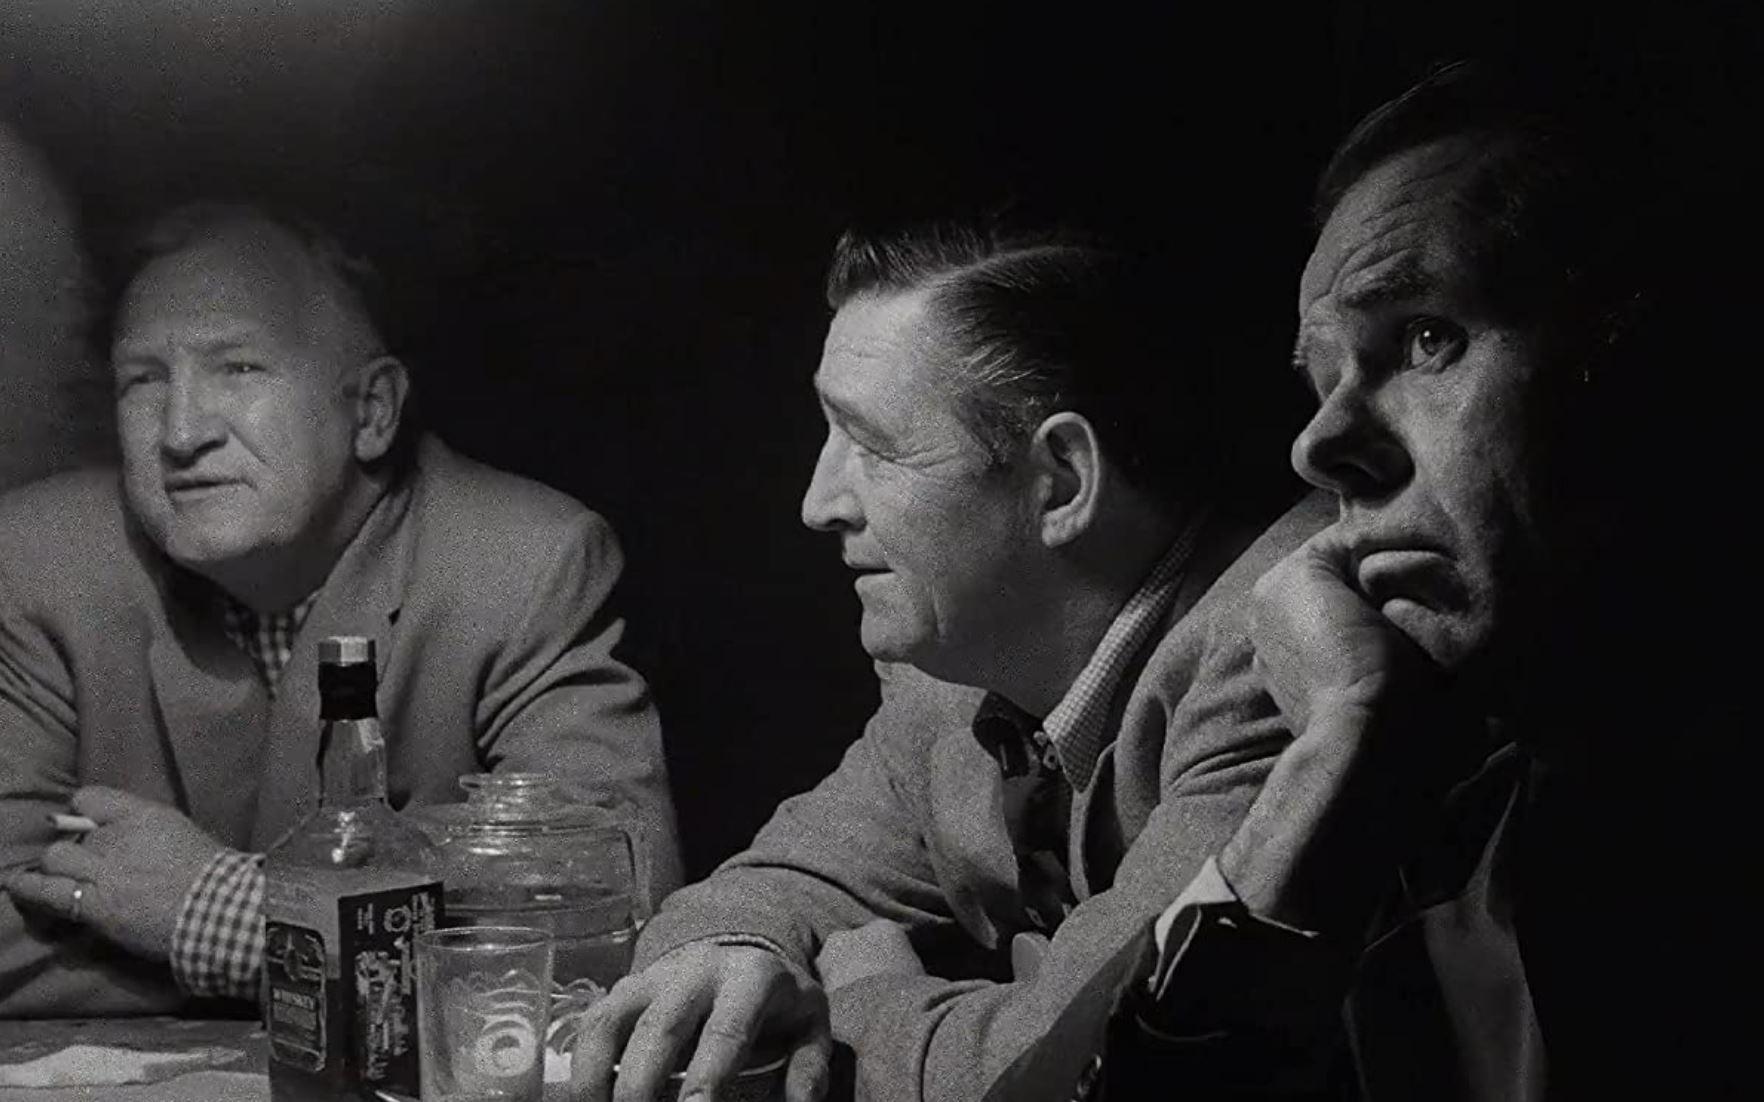 Elisha Cook Jr., Ted de Corsia, Joe Sawyer in The Killing